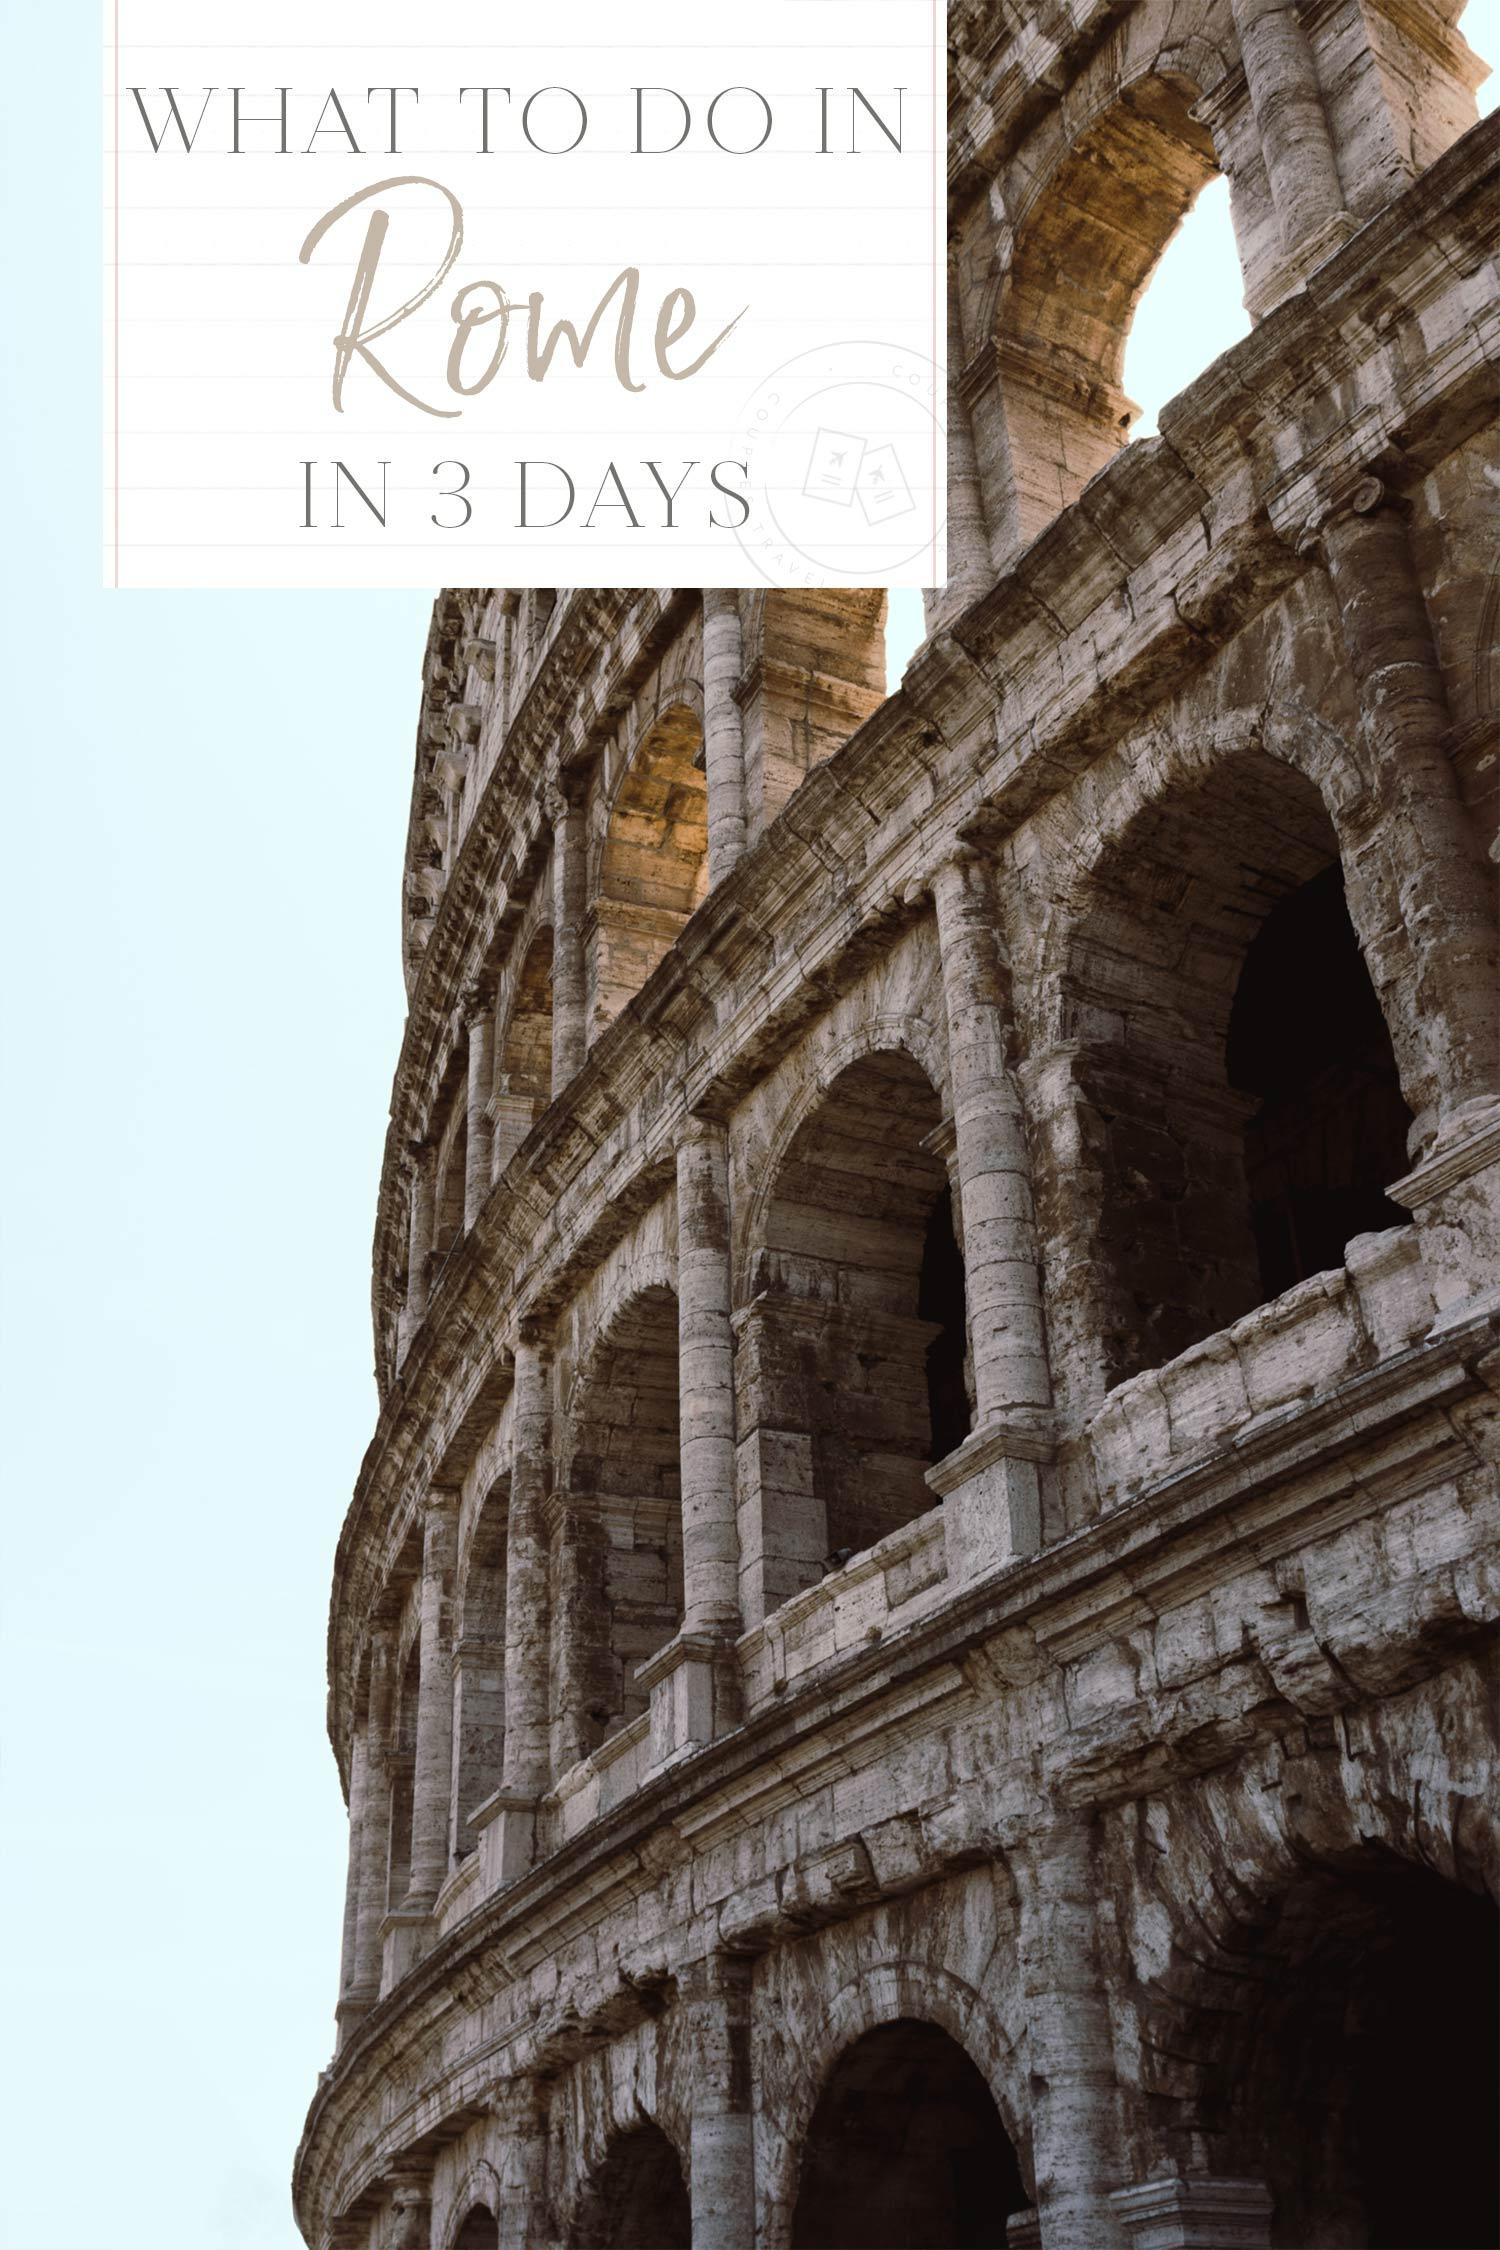 Rome 3 Days